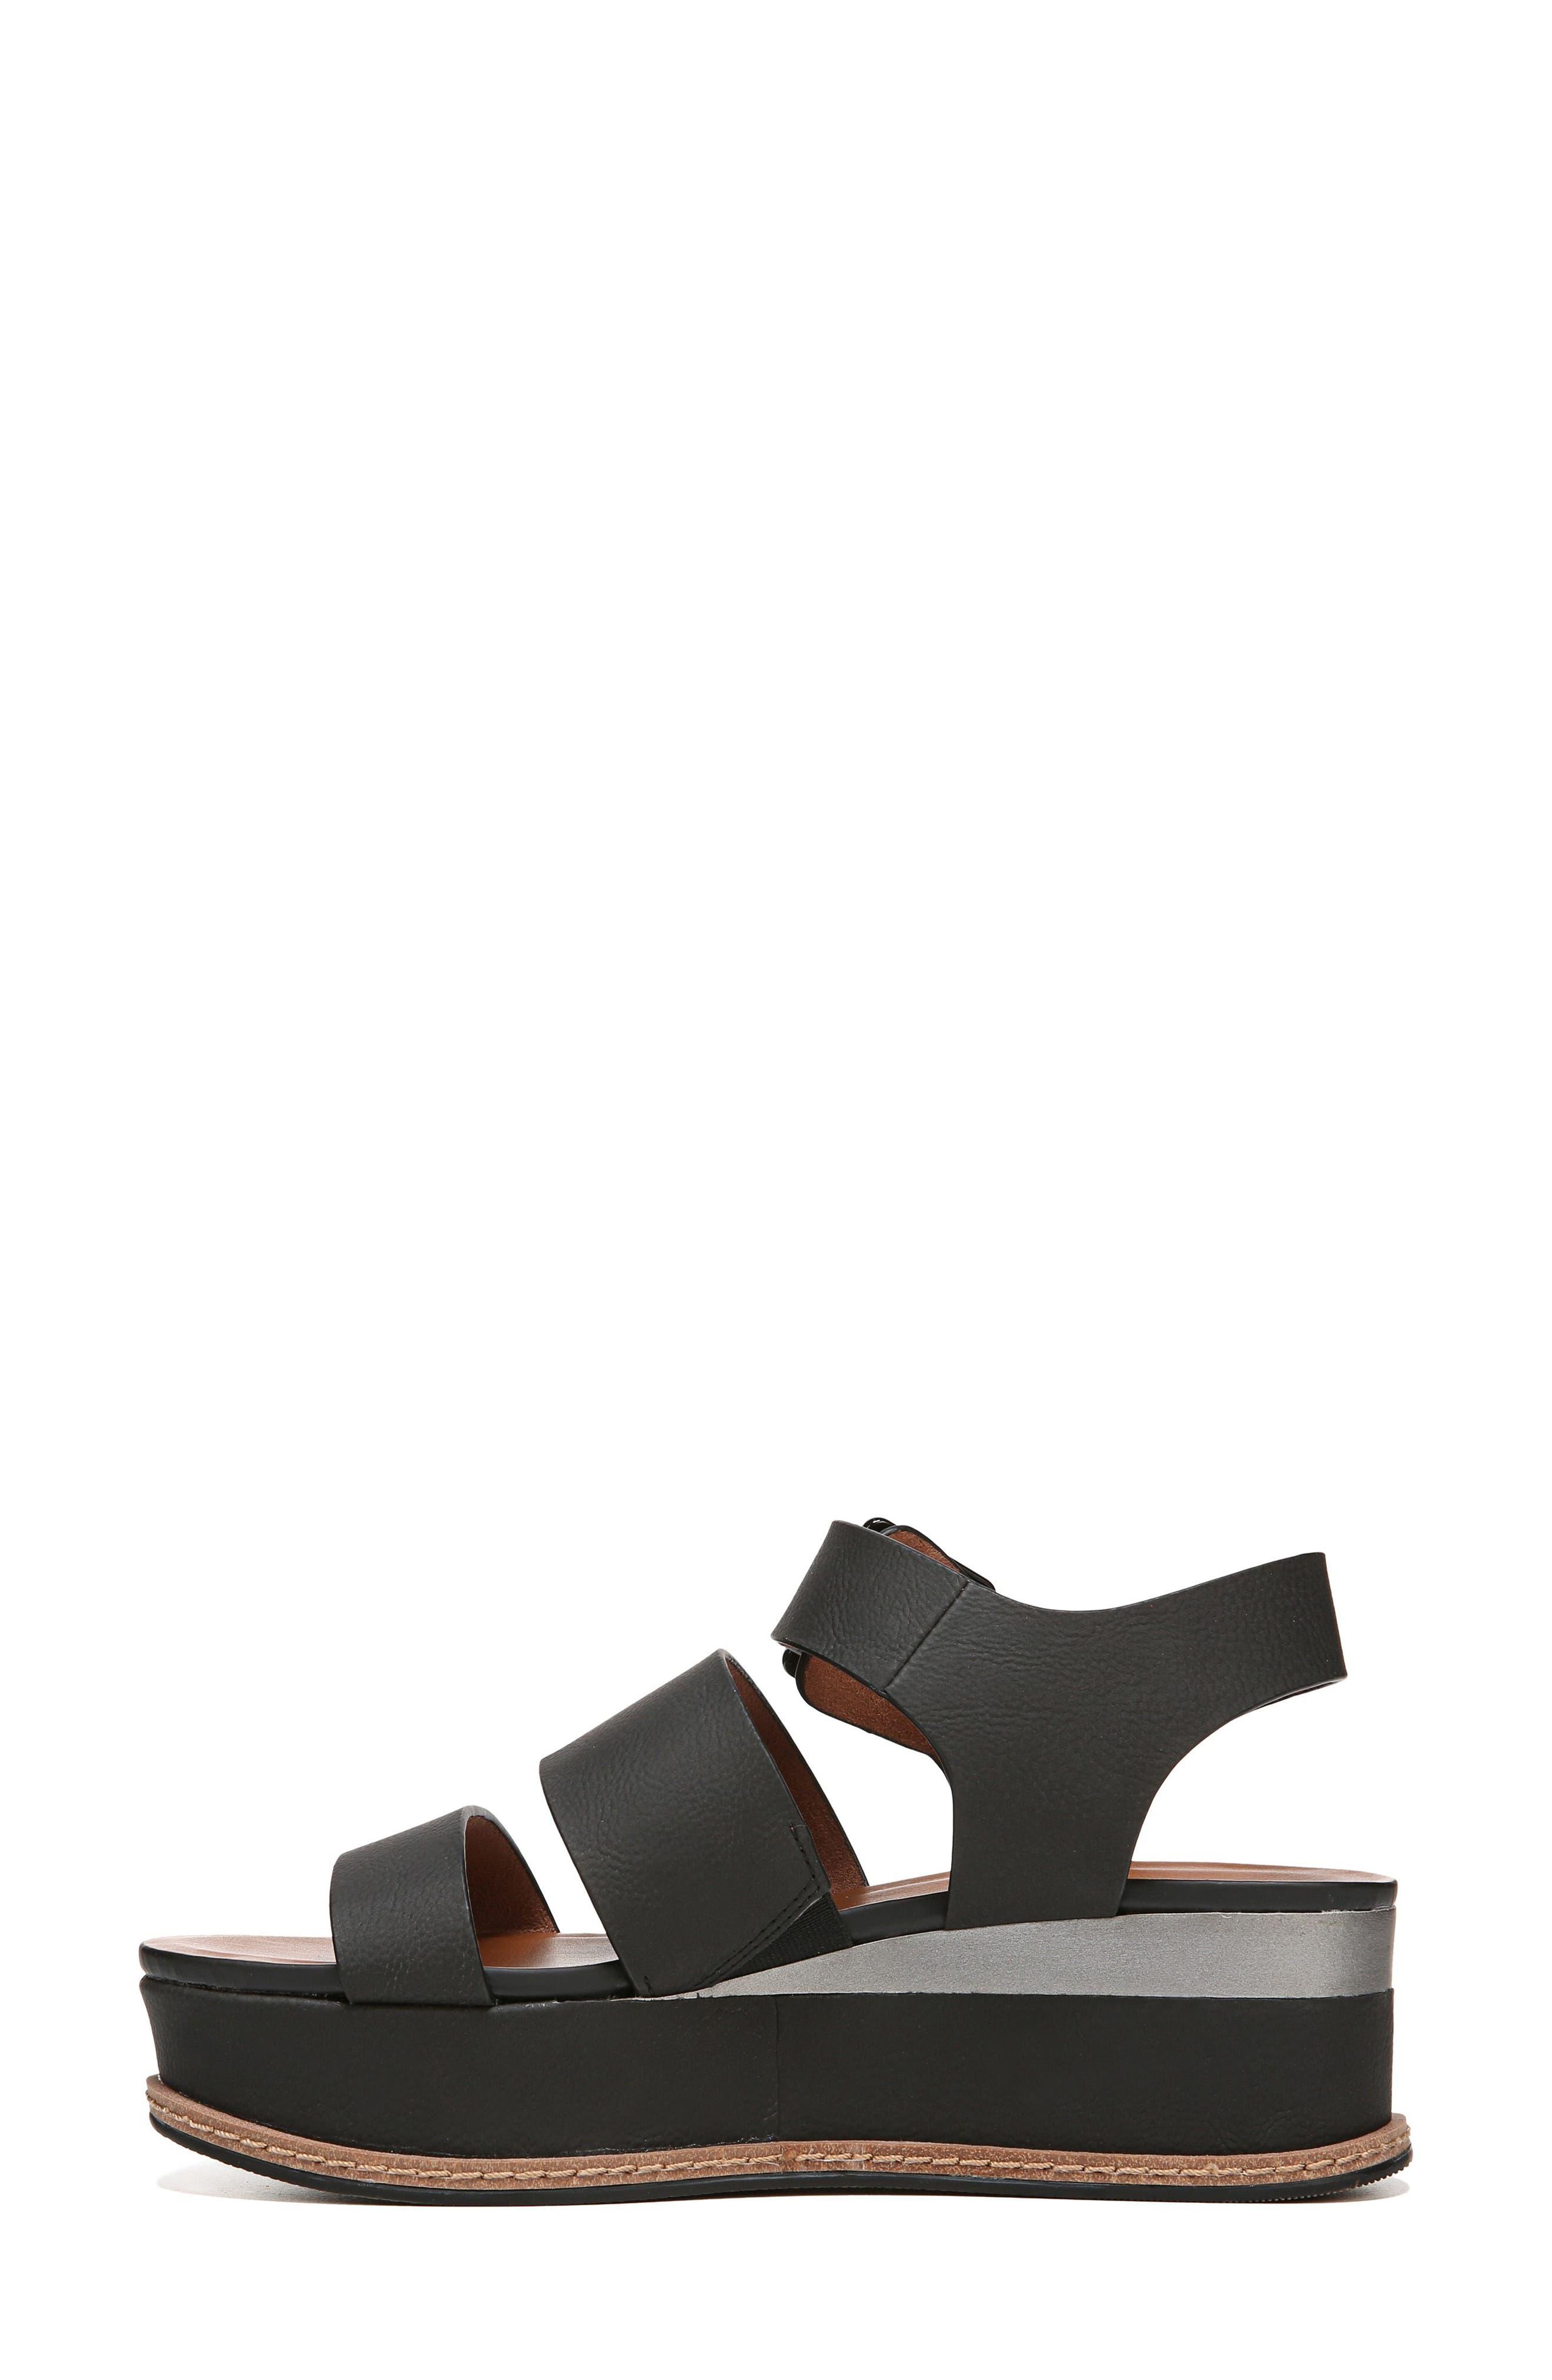 NATURALIZER, Billie Platform Sandal, Alternate thumbnail 3, color, BLACK FAUX NUBUCK LEATHER